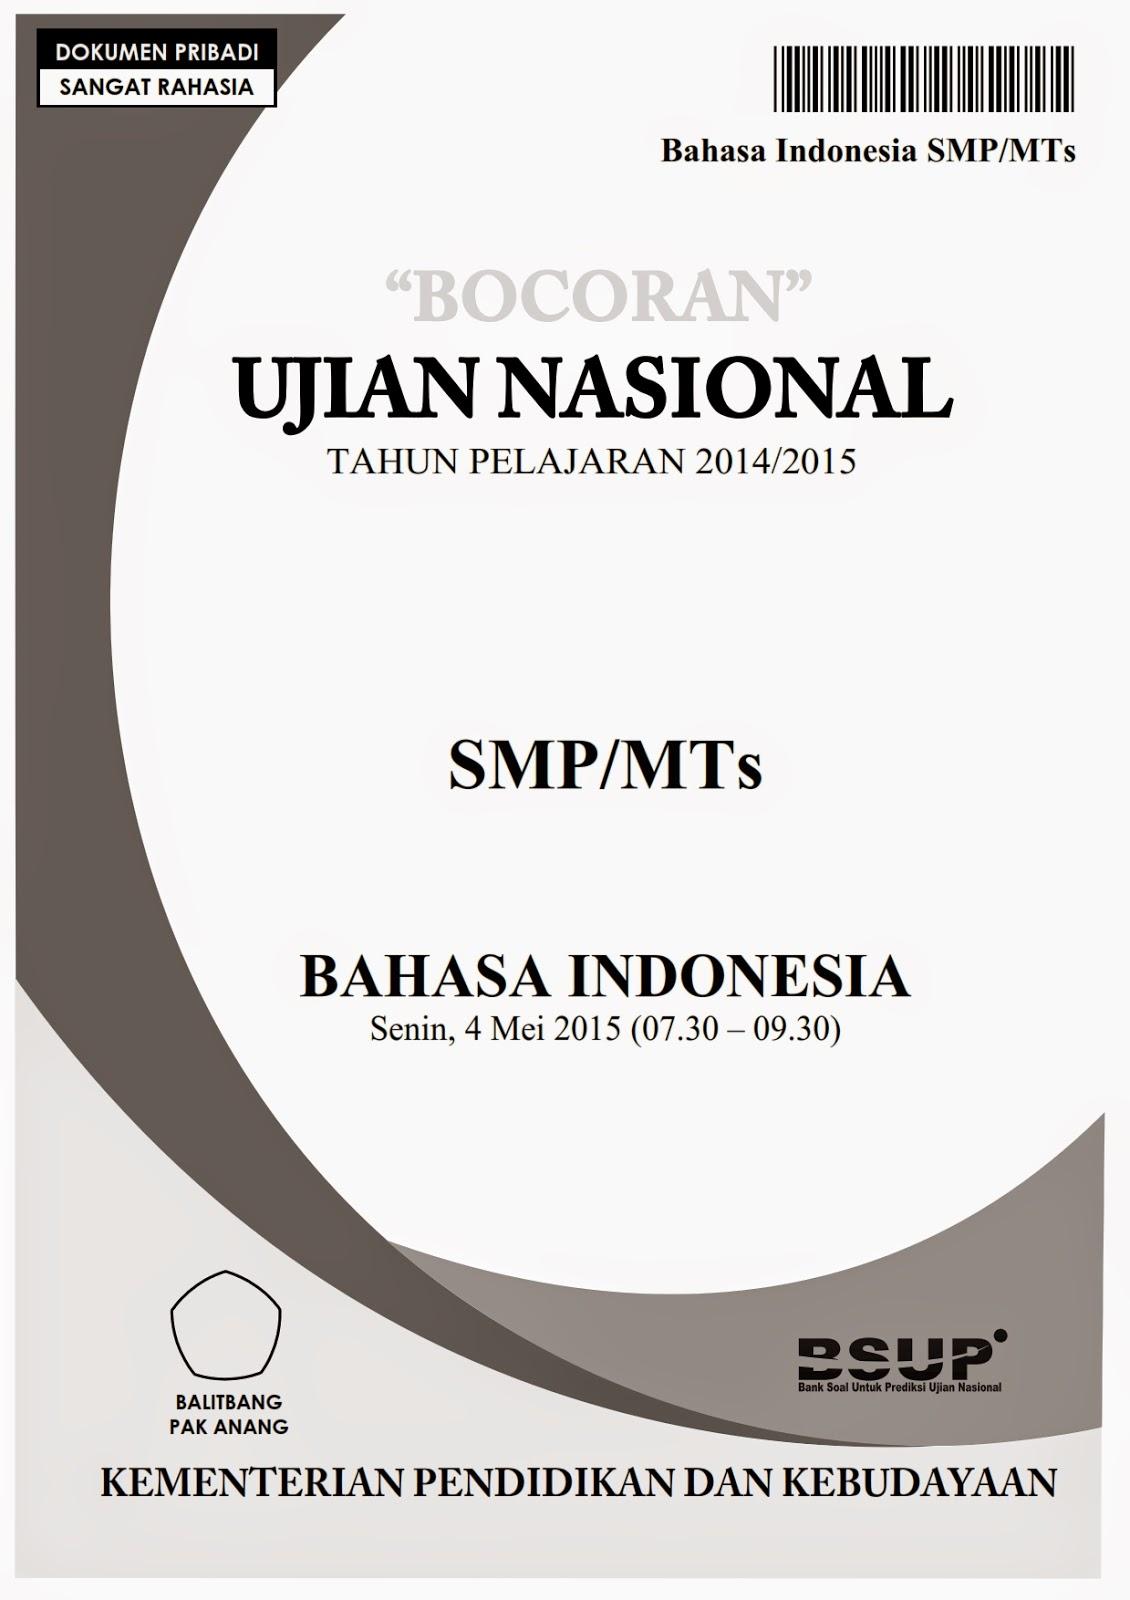 Quot Bocoran Quot Soal Un Bahasa Indonesia Smp 2015 Rangkuman Materi